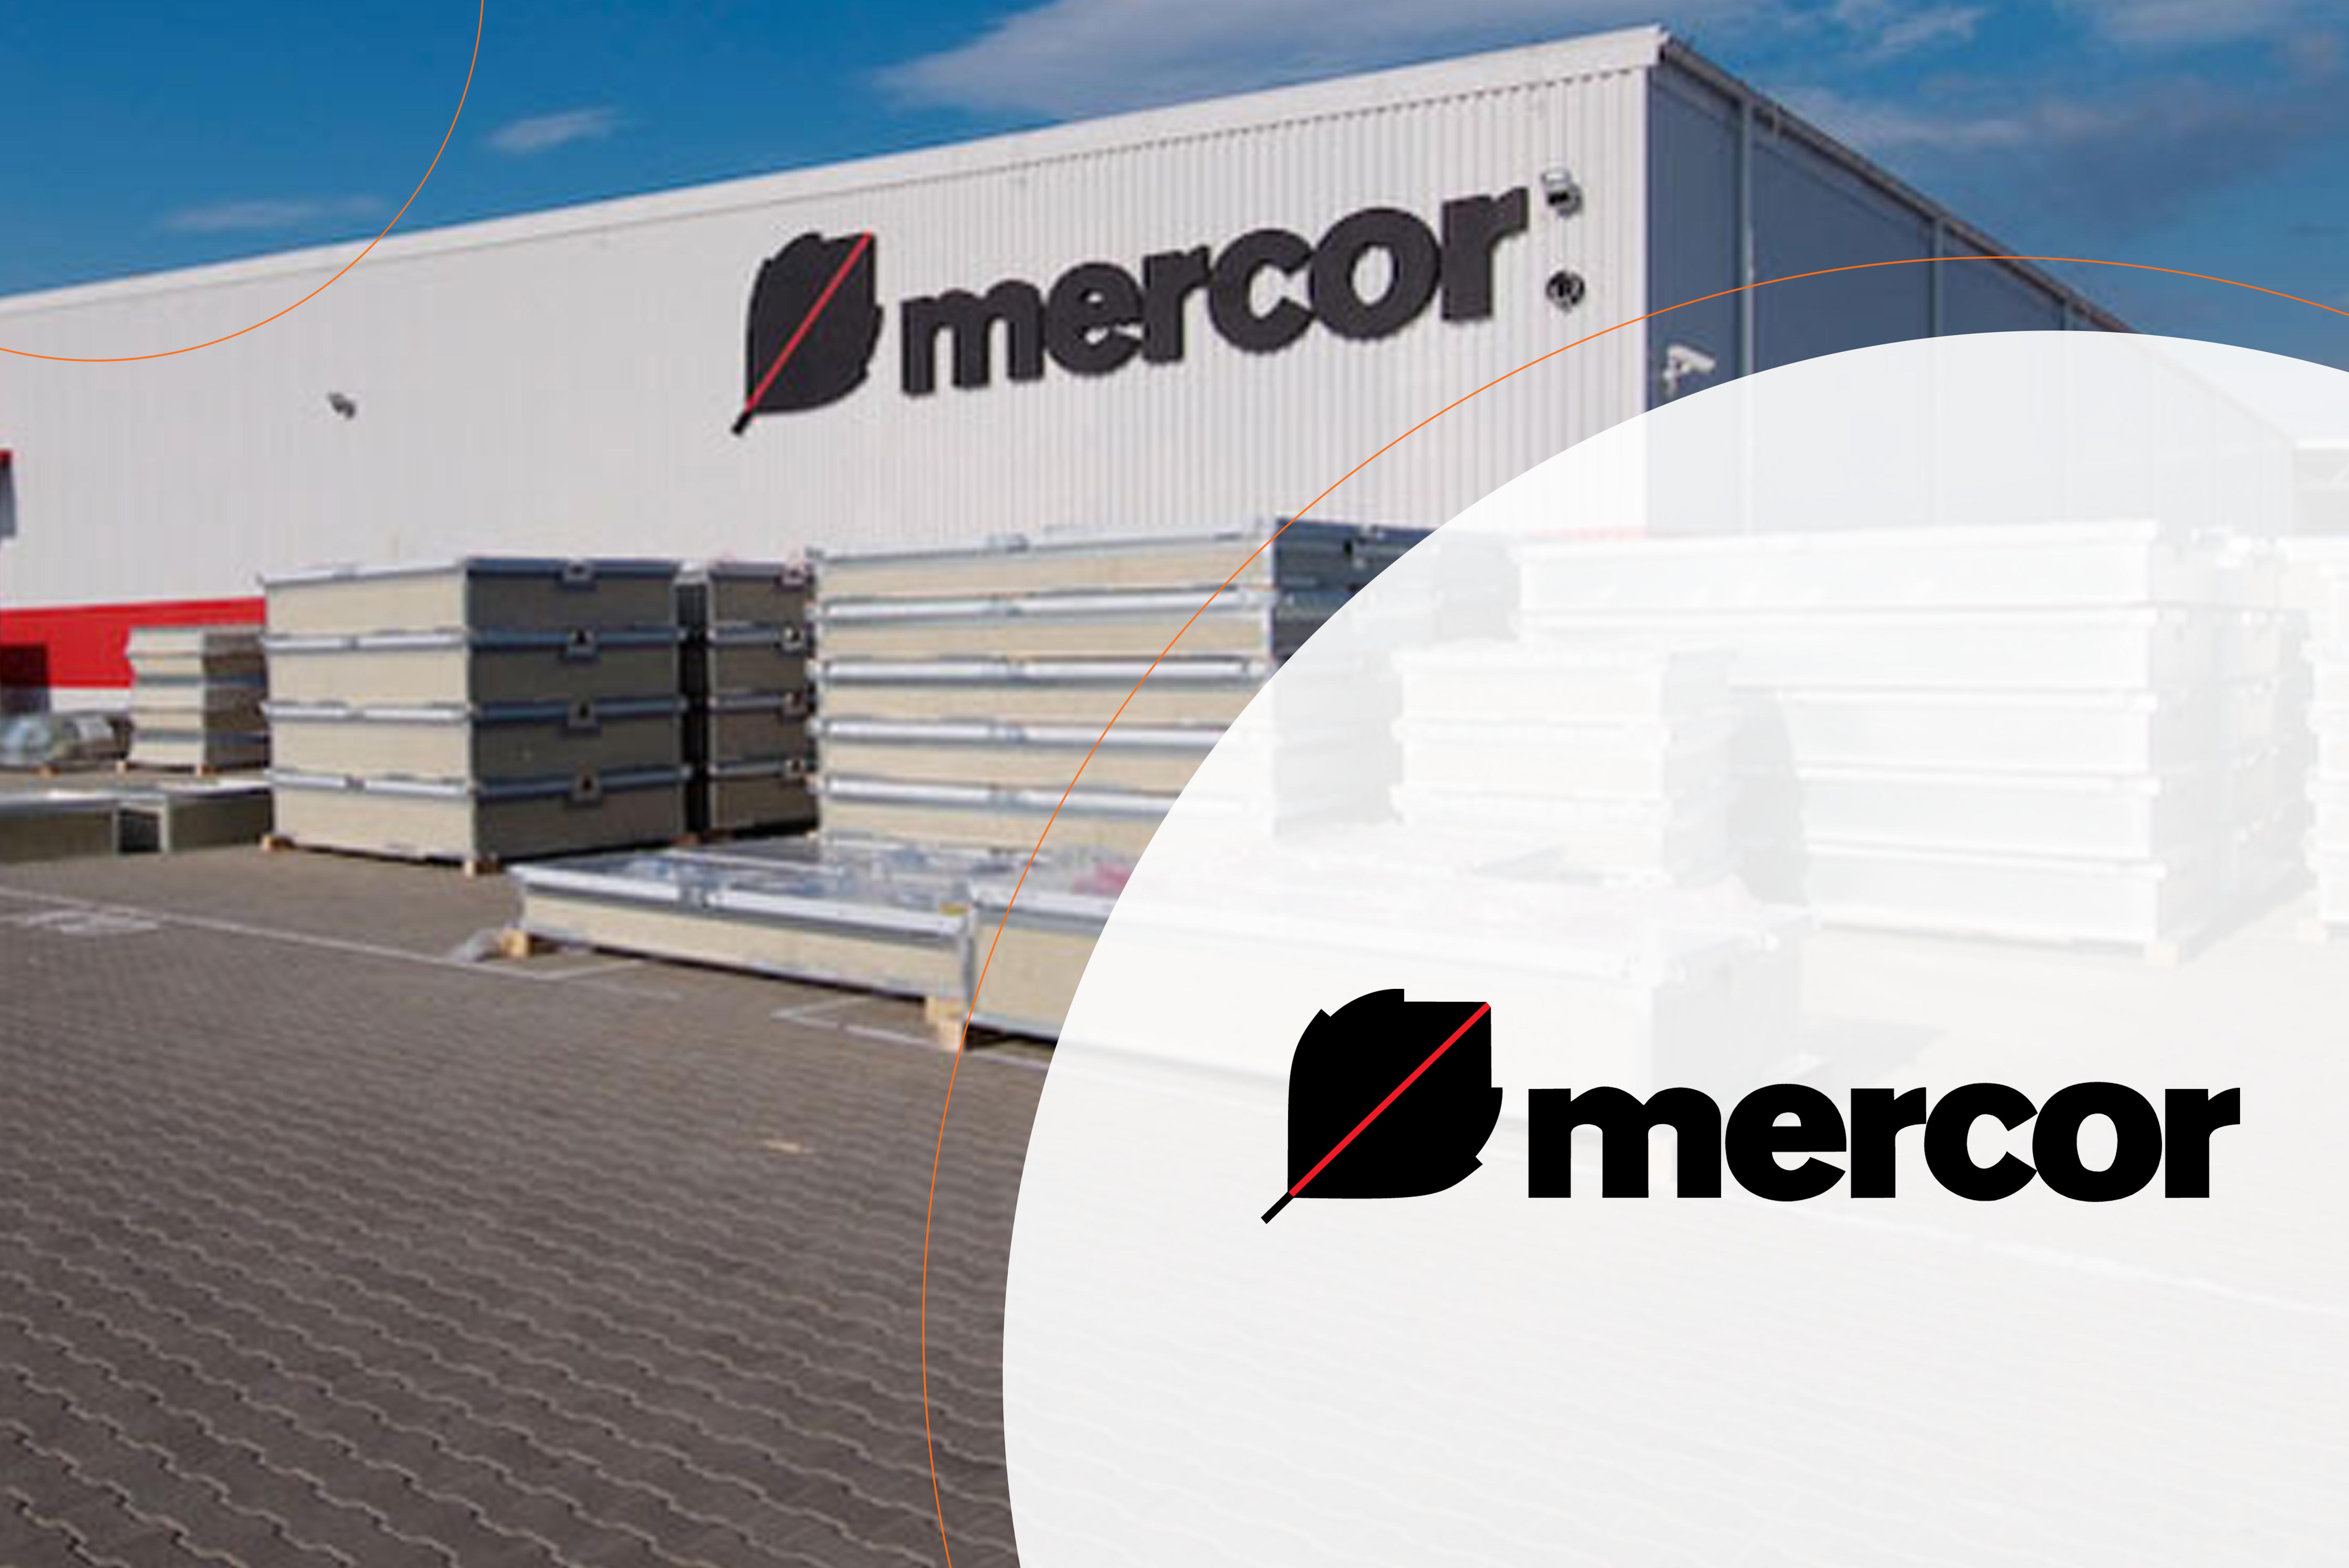 mercor_story_web